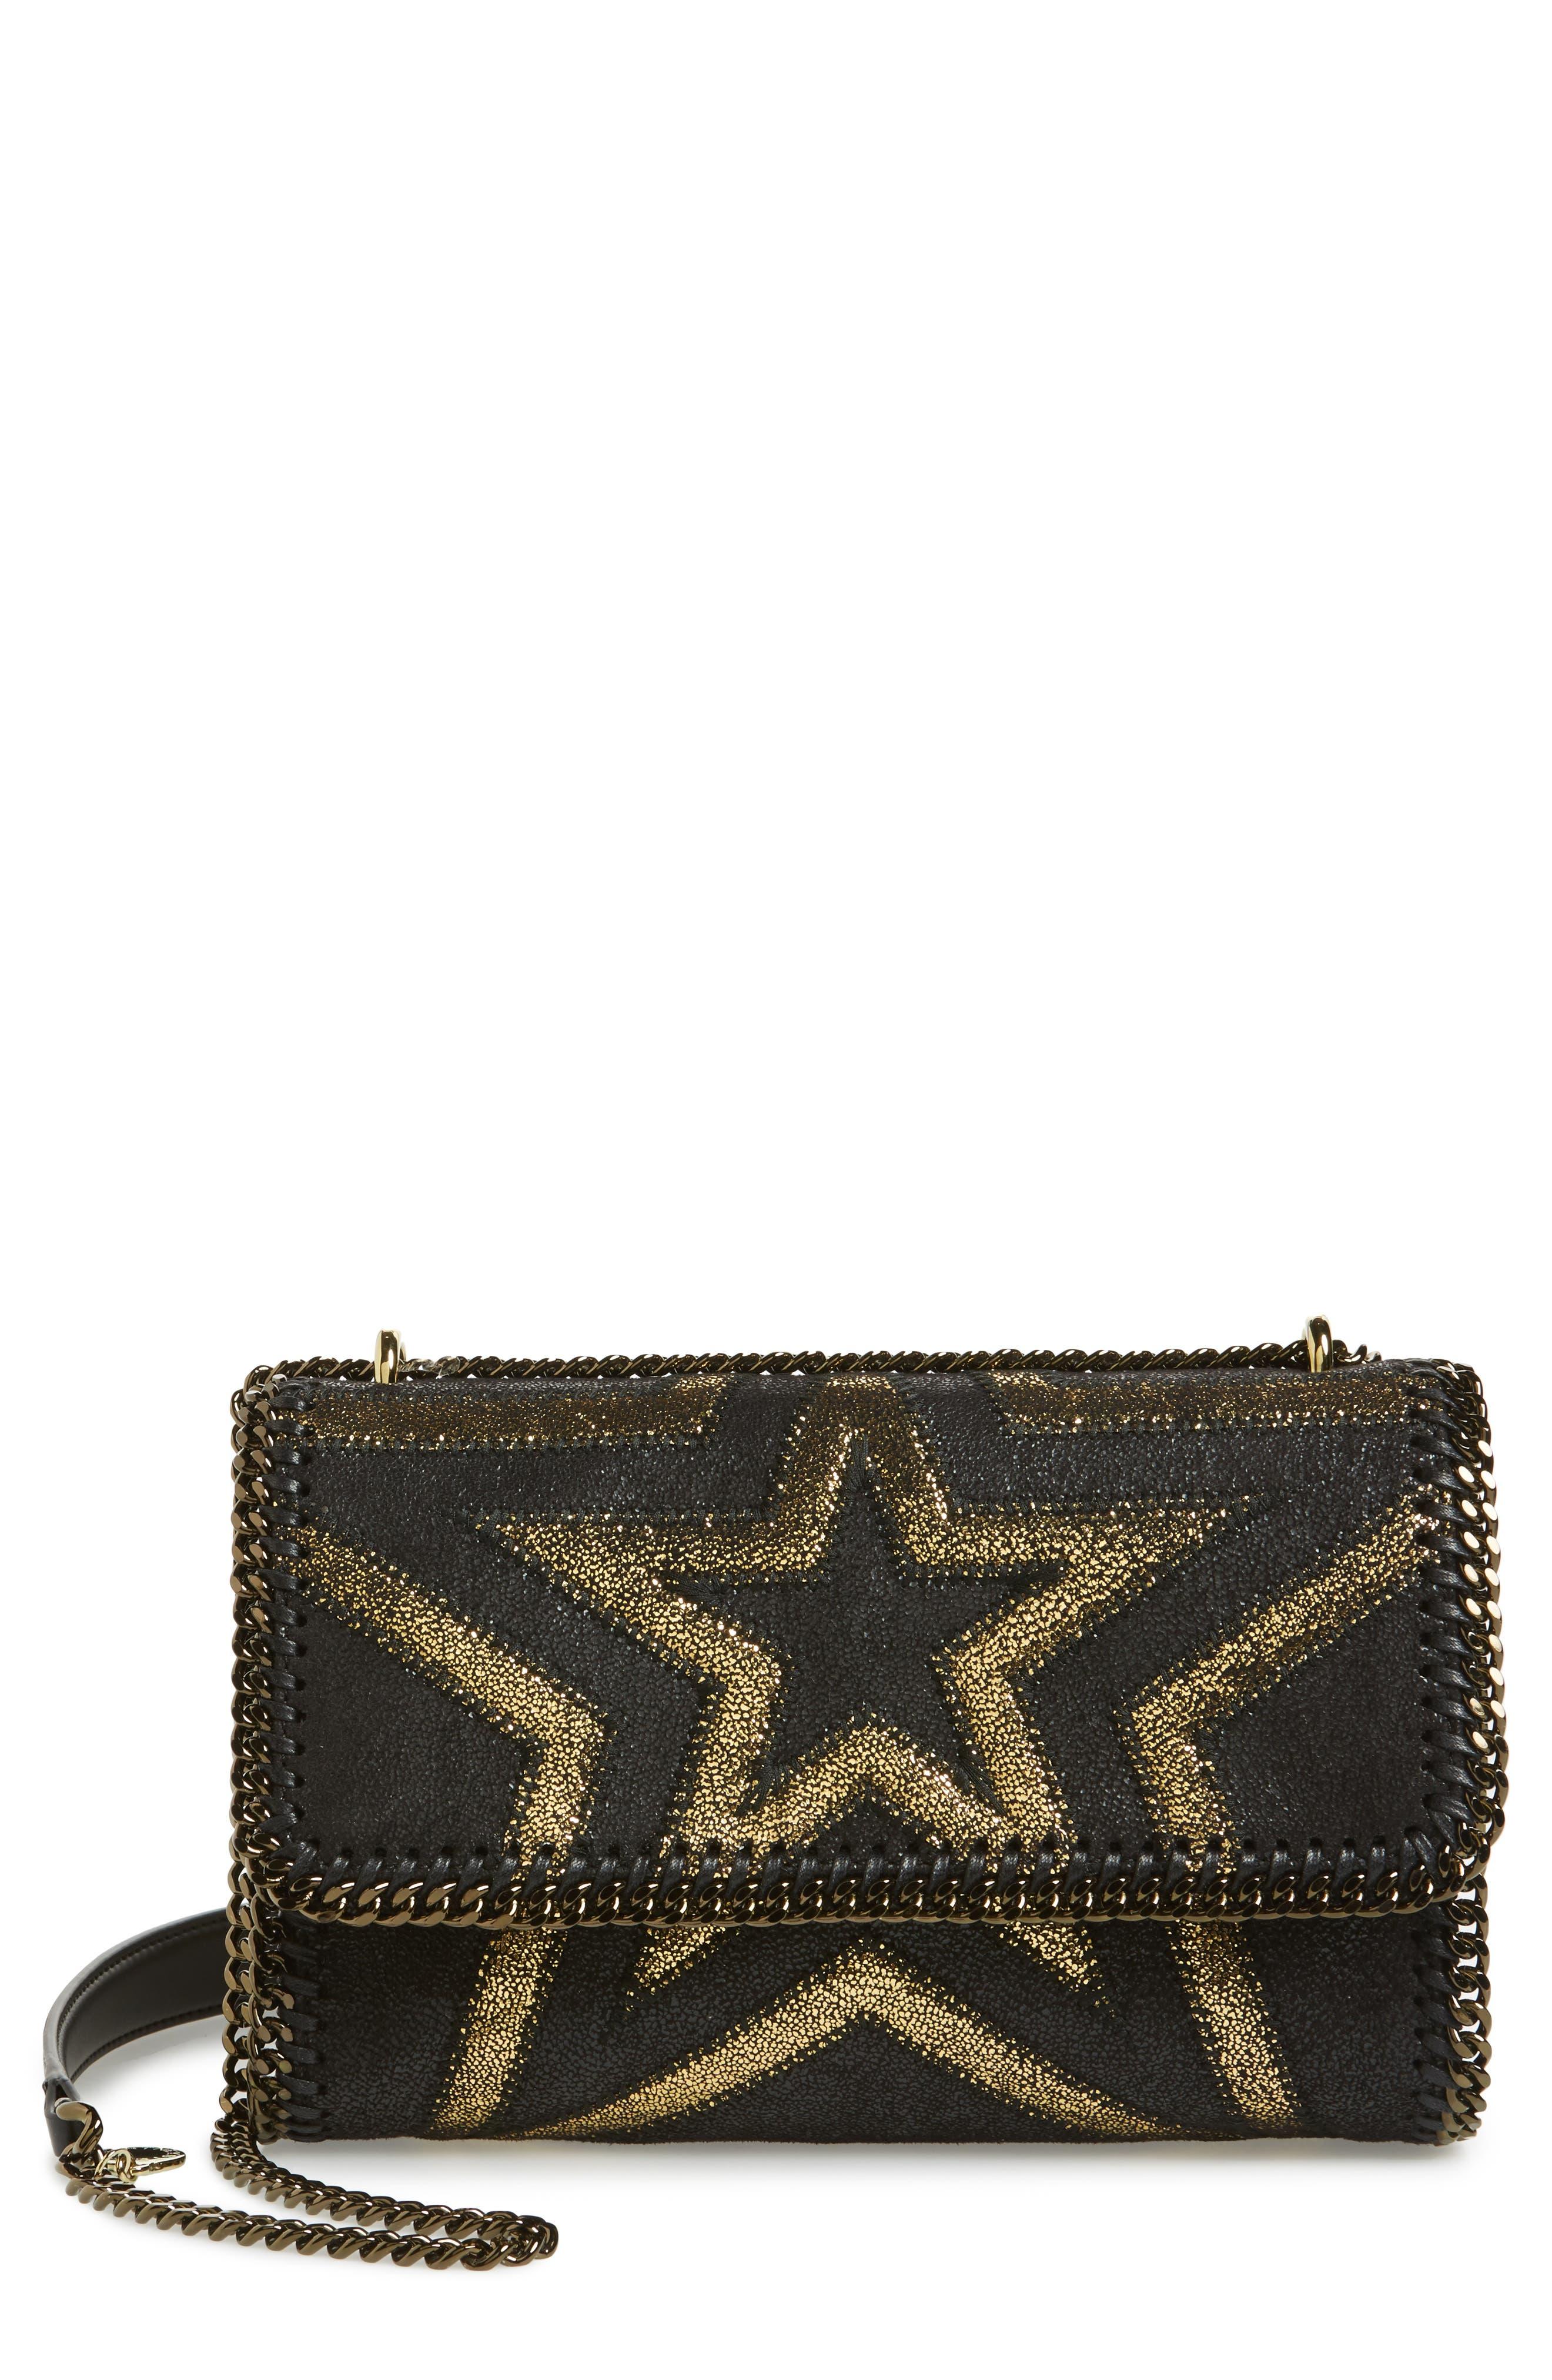 Small Falabella Shaggy Deer Star Faux Leather Shoulder Bag,                             Main thumbnail 1, color,                             001